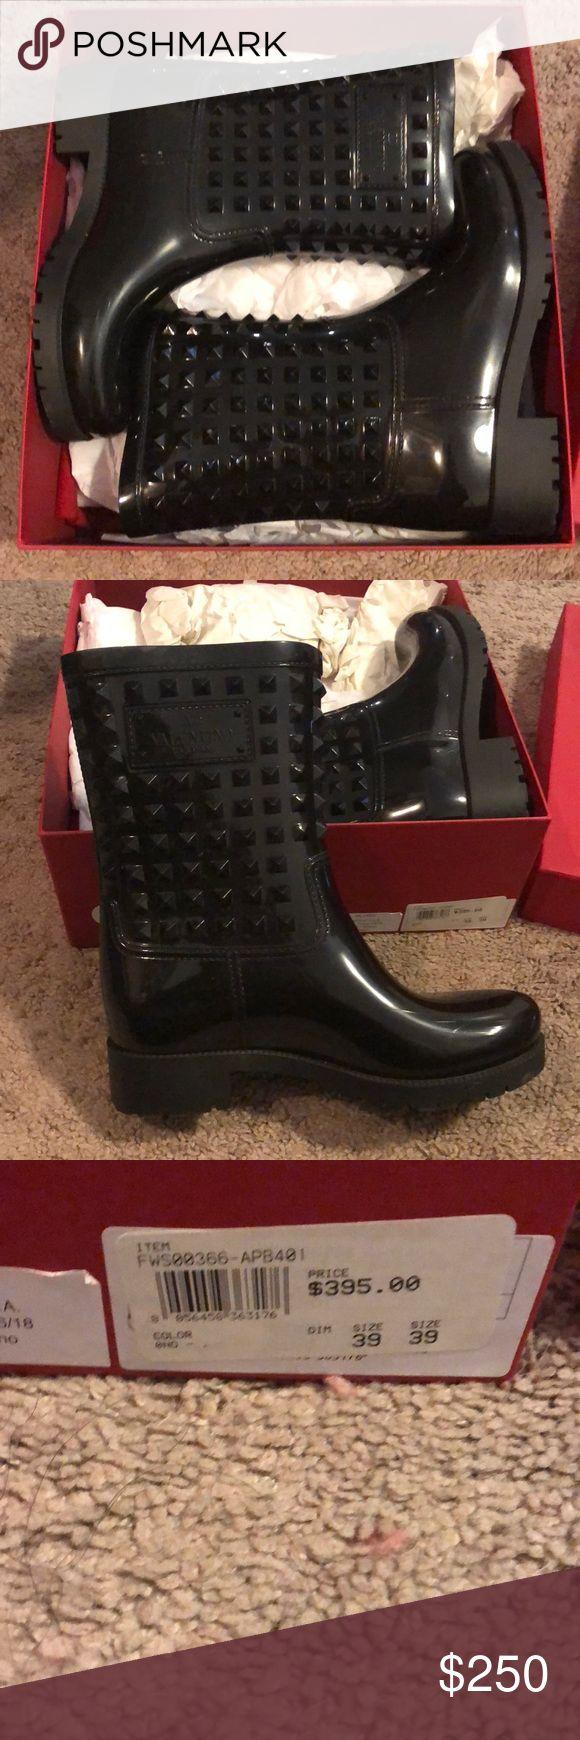 Valentino rain boots Valentino rain boots worn twice Valentino Shoes Winter & Rain Boots